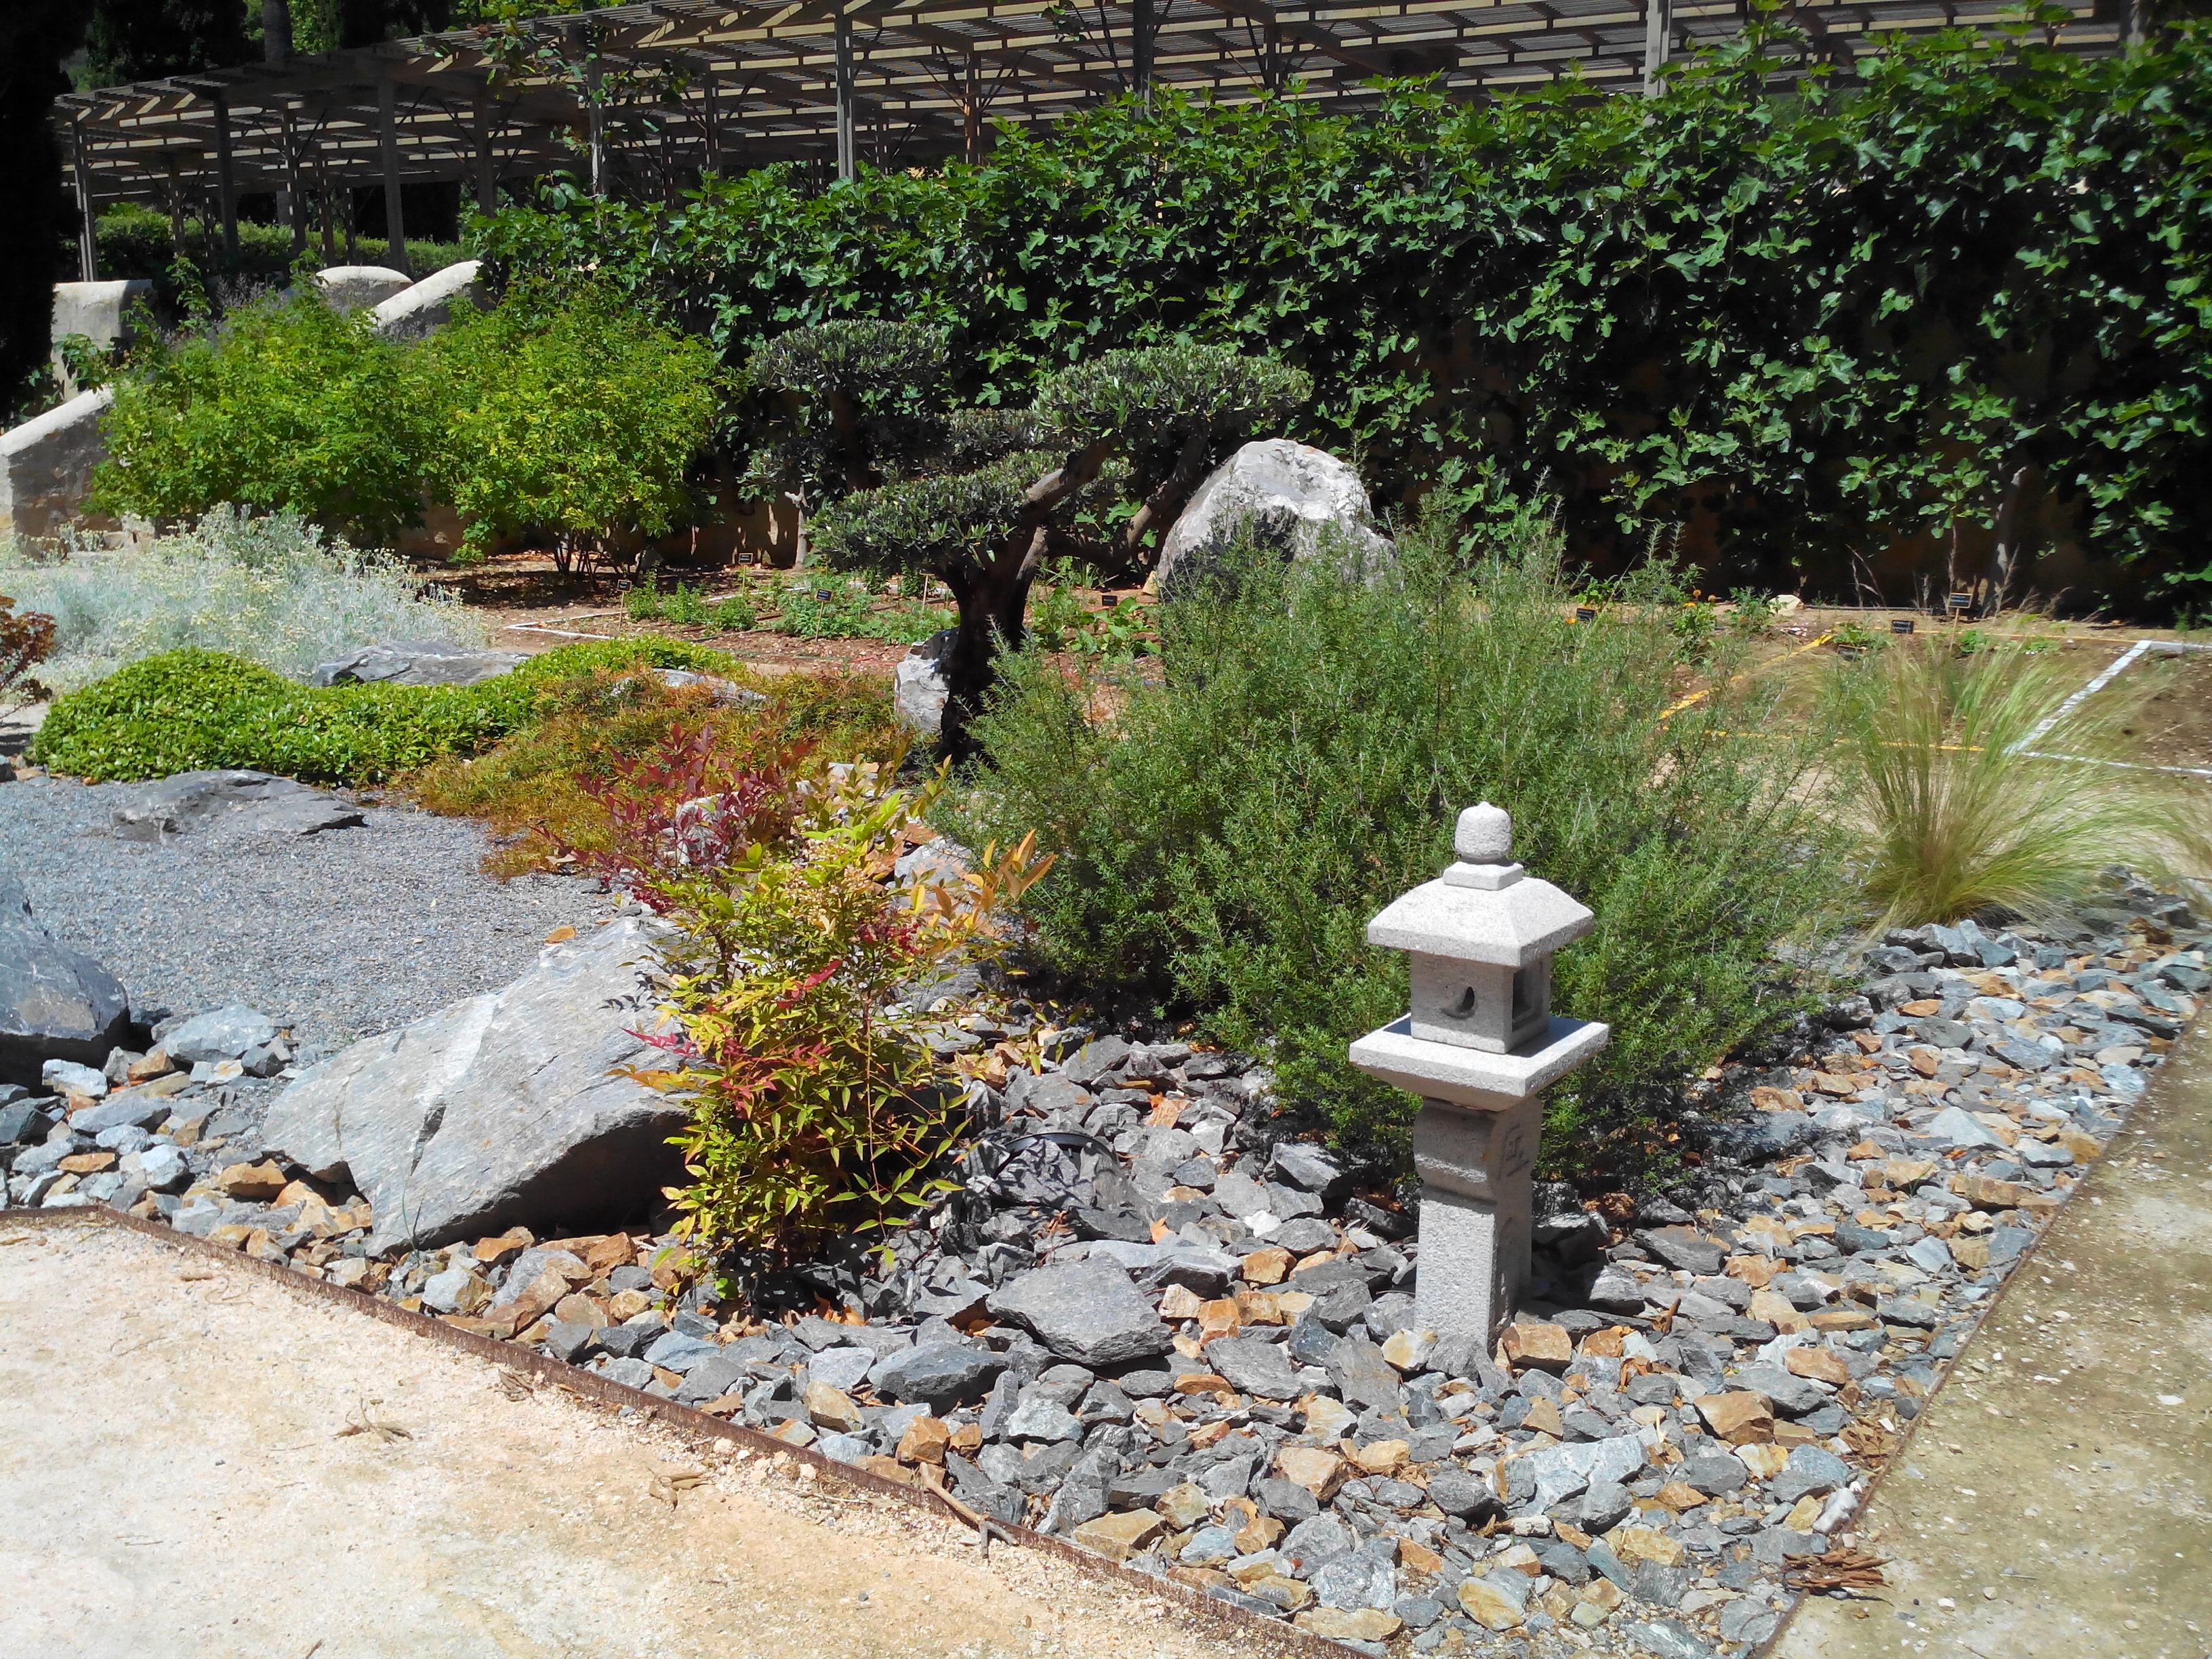 Nain de jardin en plastique nain de jardin siffleur pelle for Acheter un nain de jardin